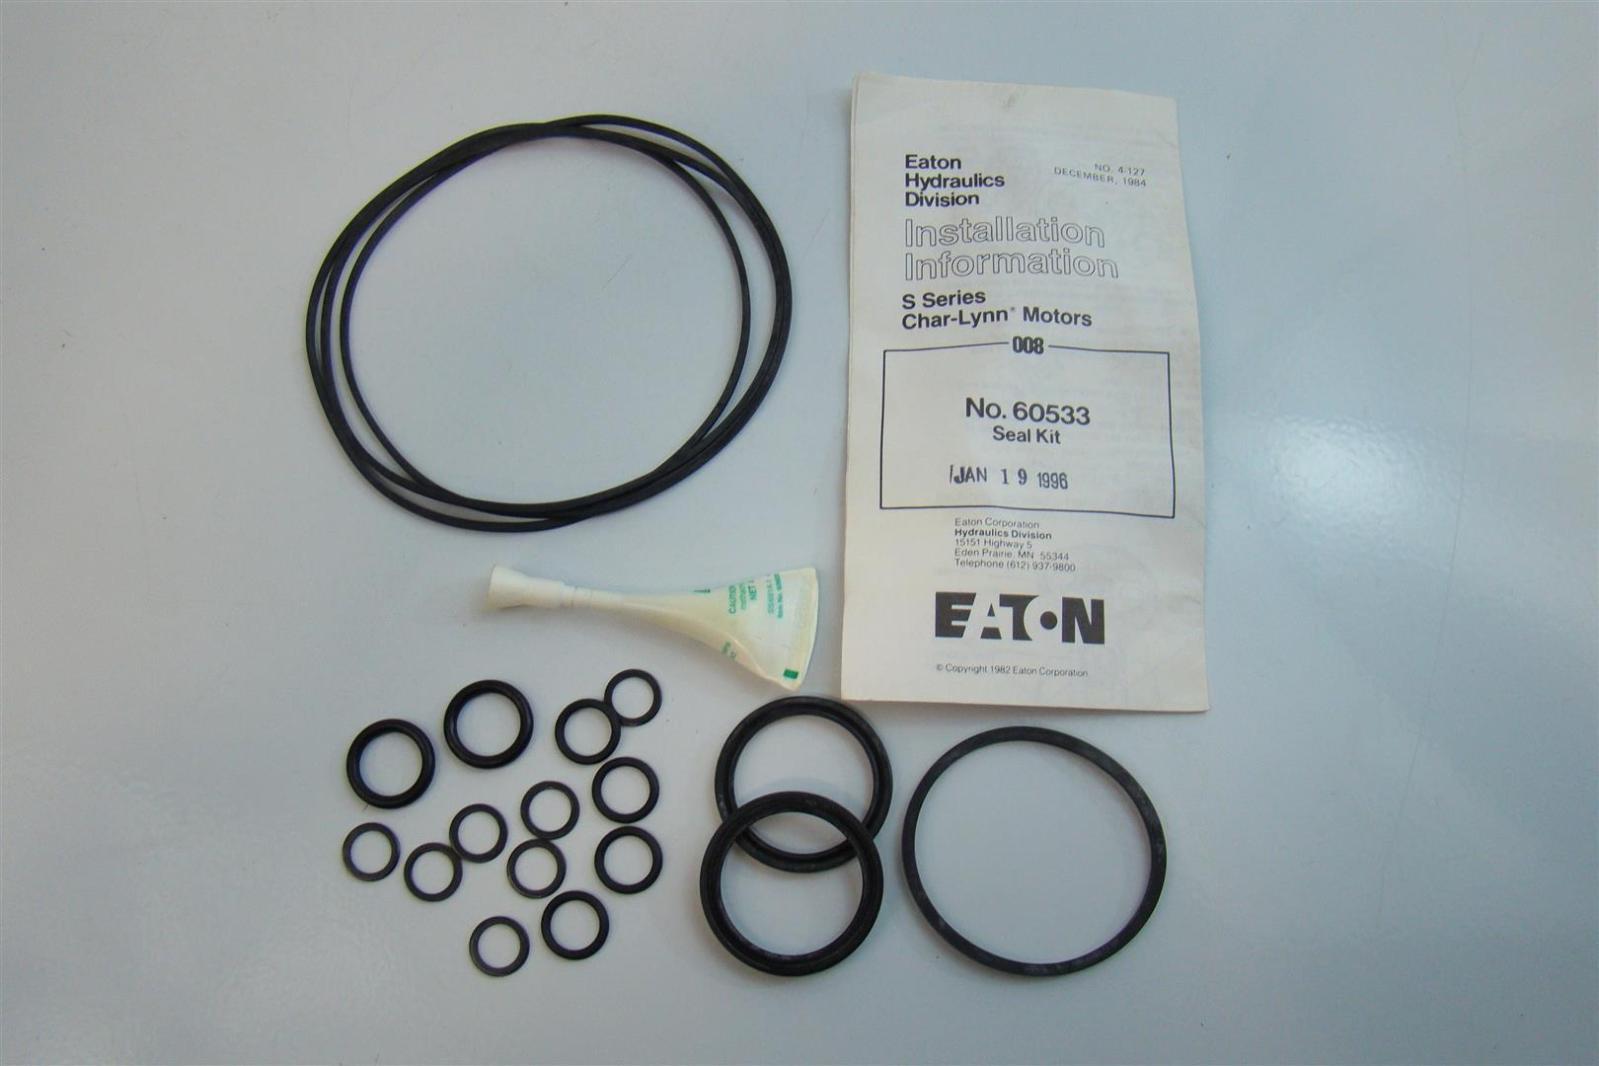 eaton hydraulics division char lynn motors seal kit 60533